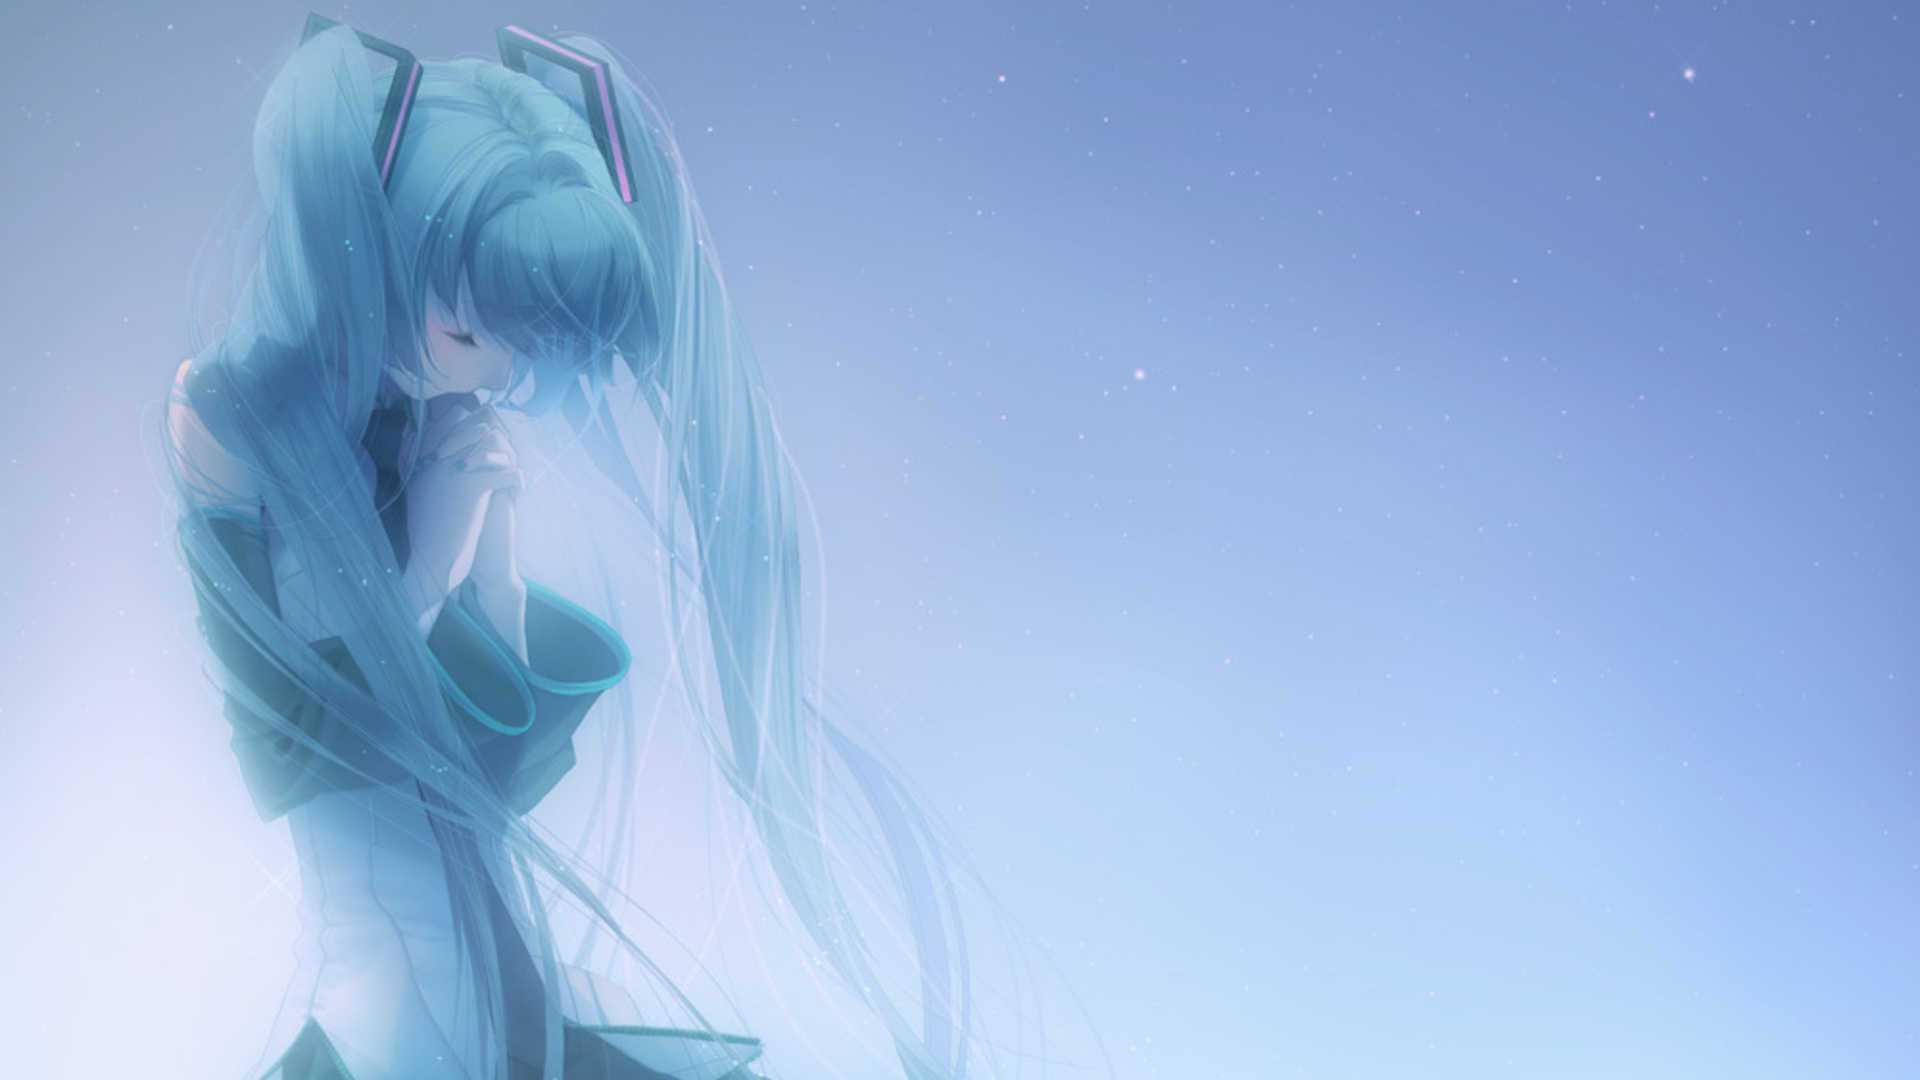 Free Vocaloid Wallpaper Download Background Wallpaper